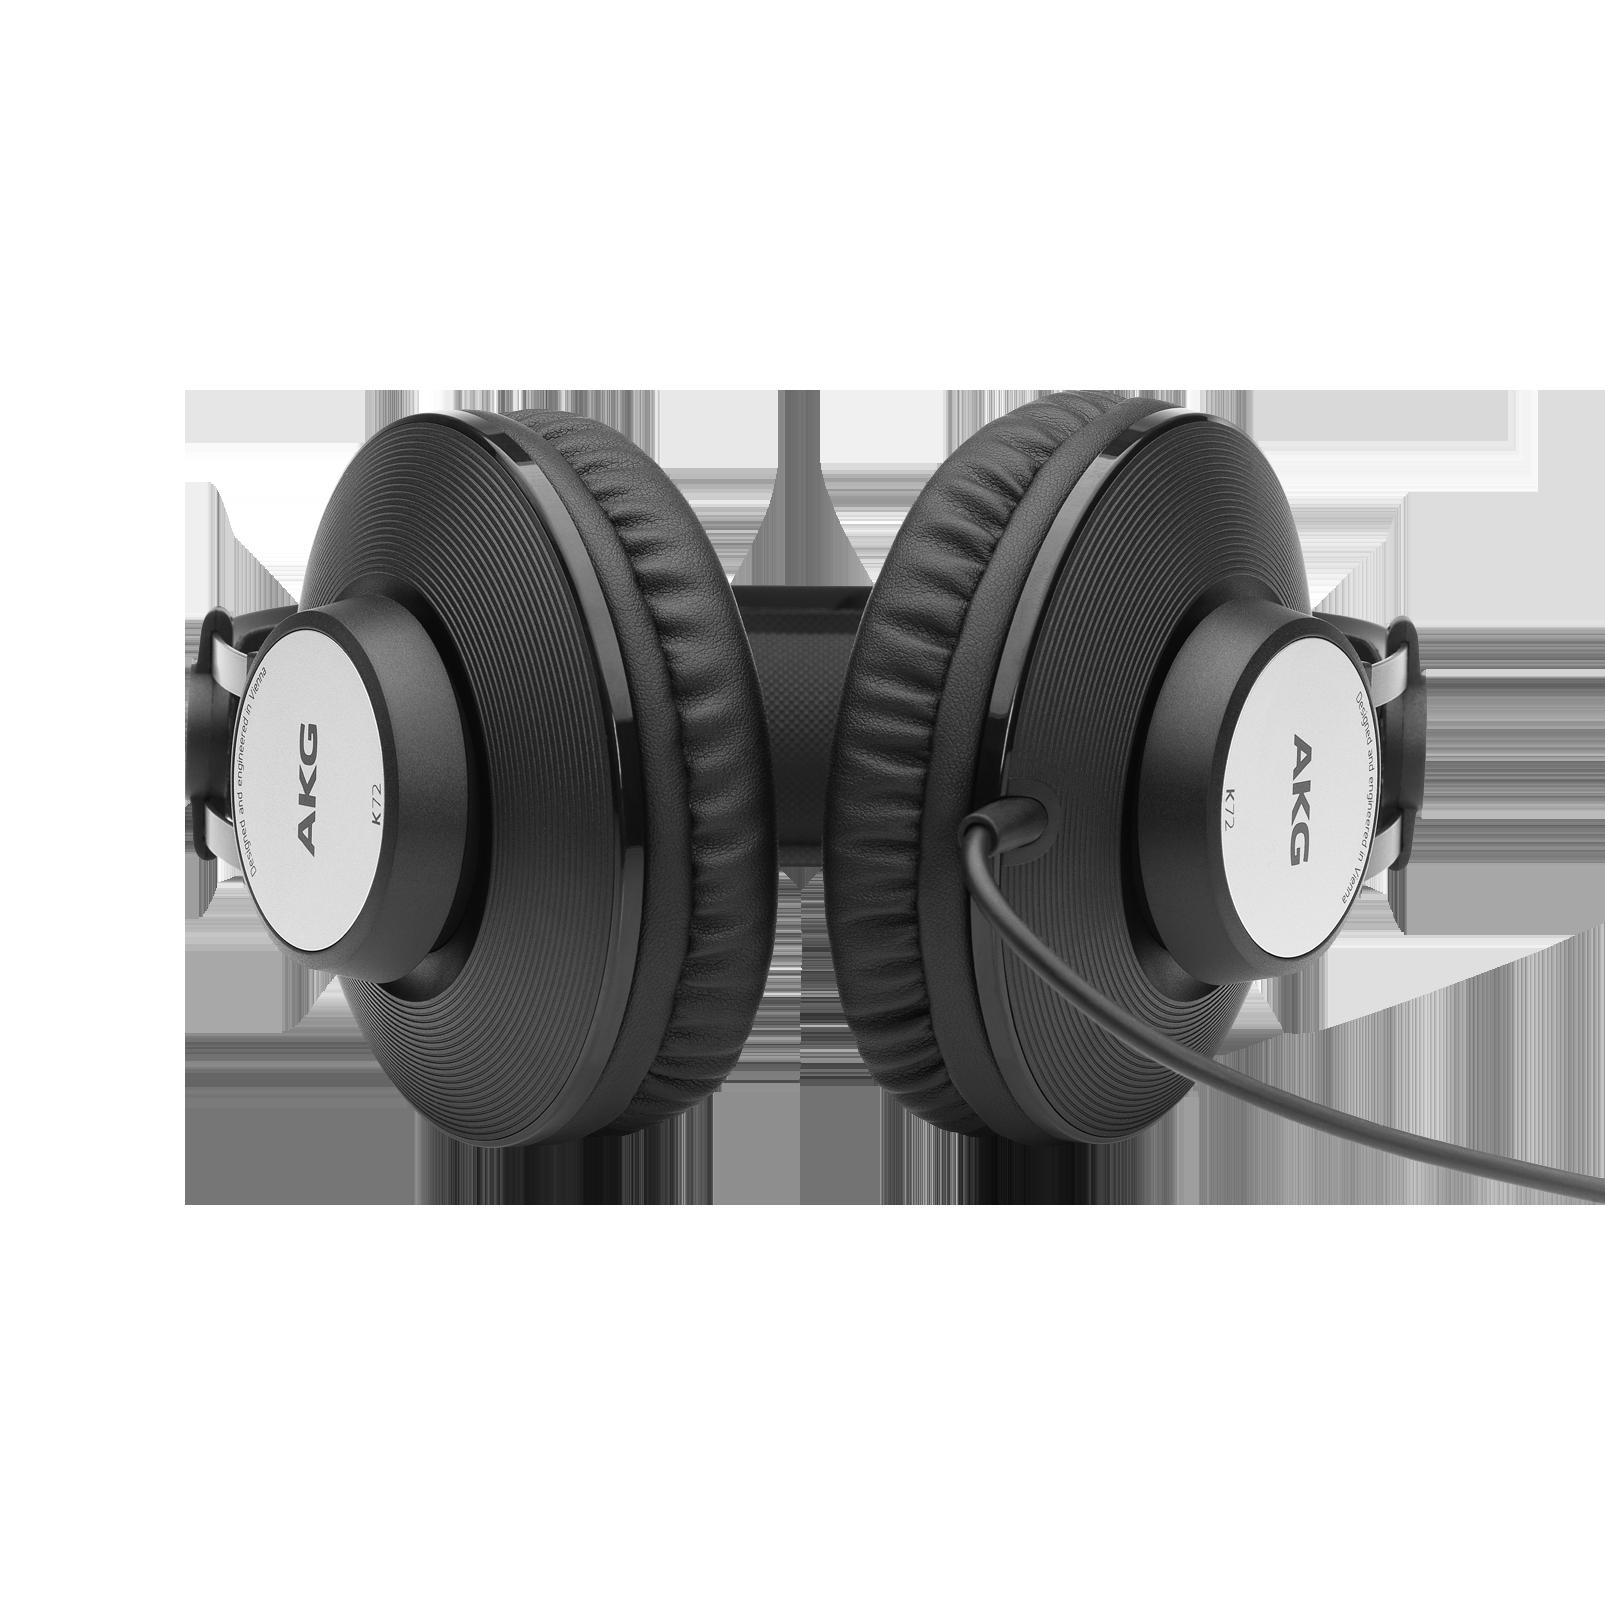 K72 - Black - Closed-back studio headphones - Detailshot 1